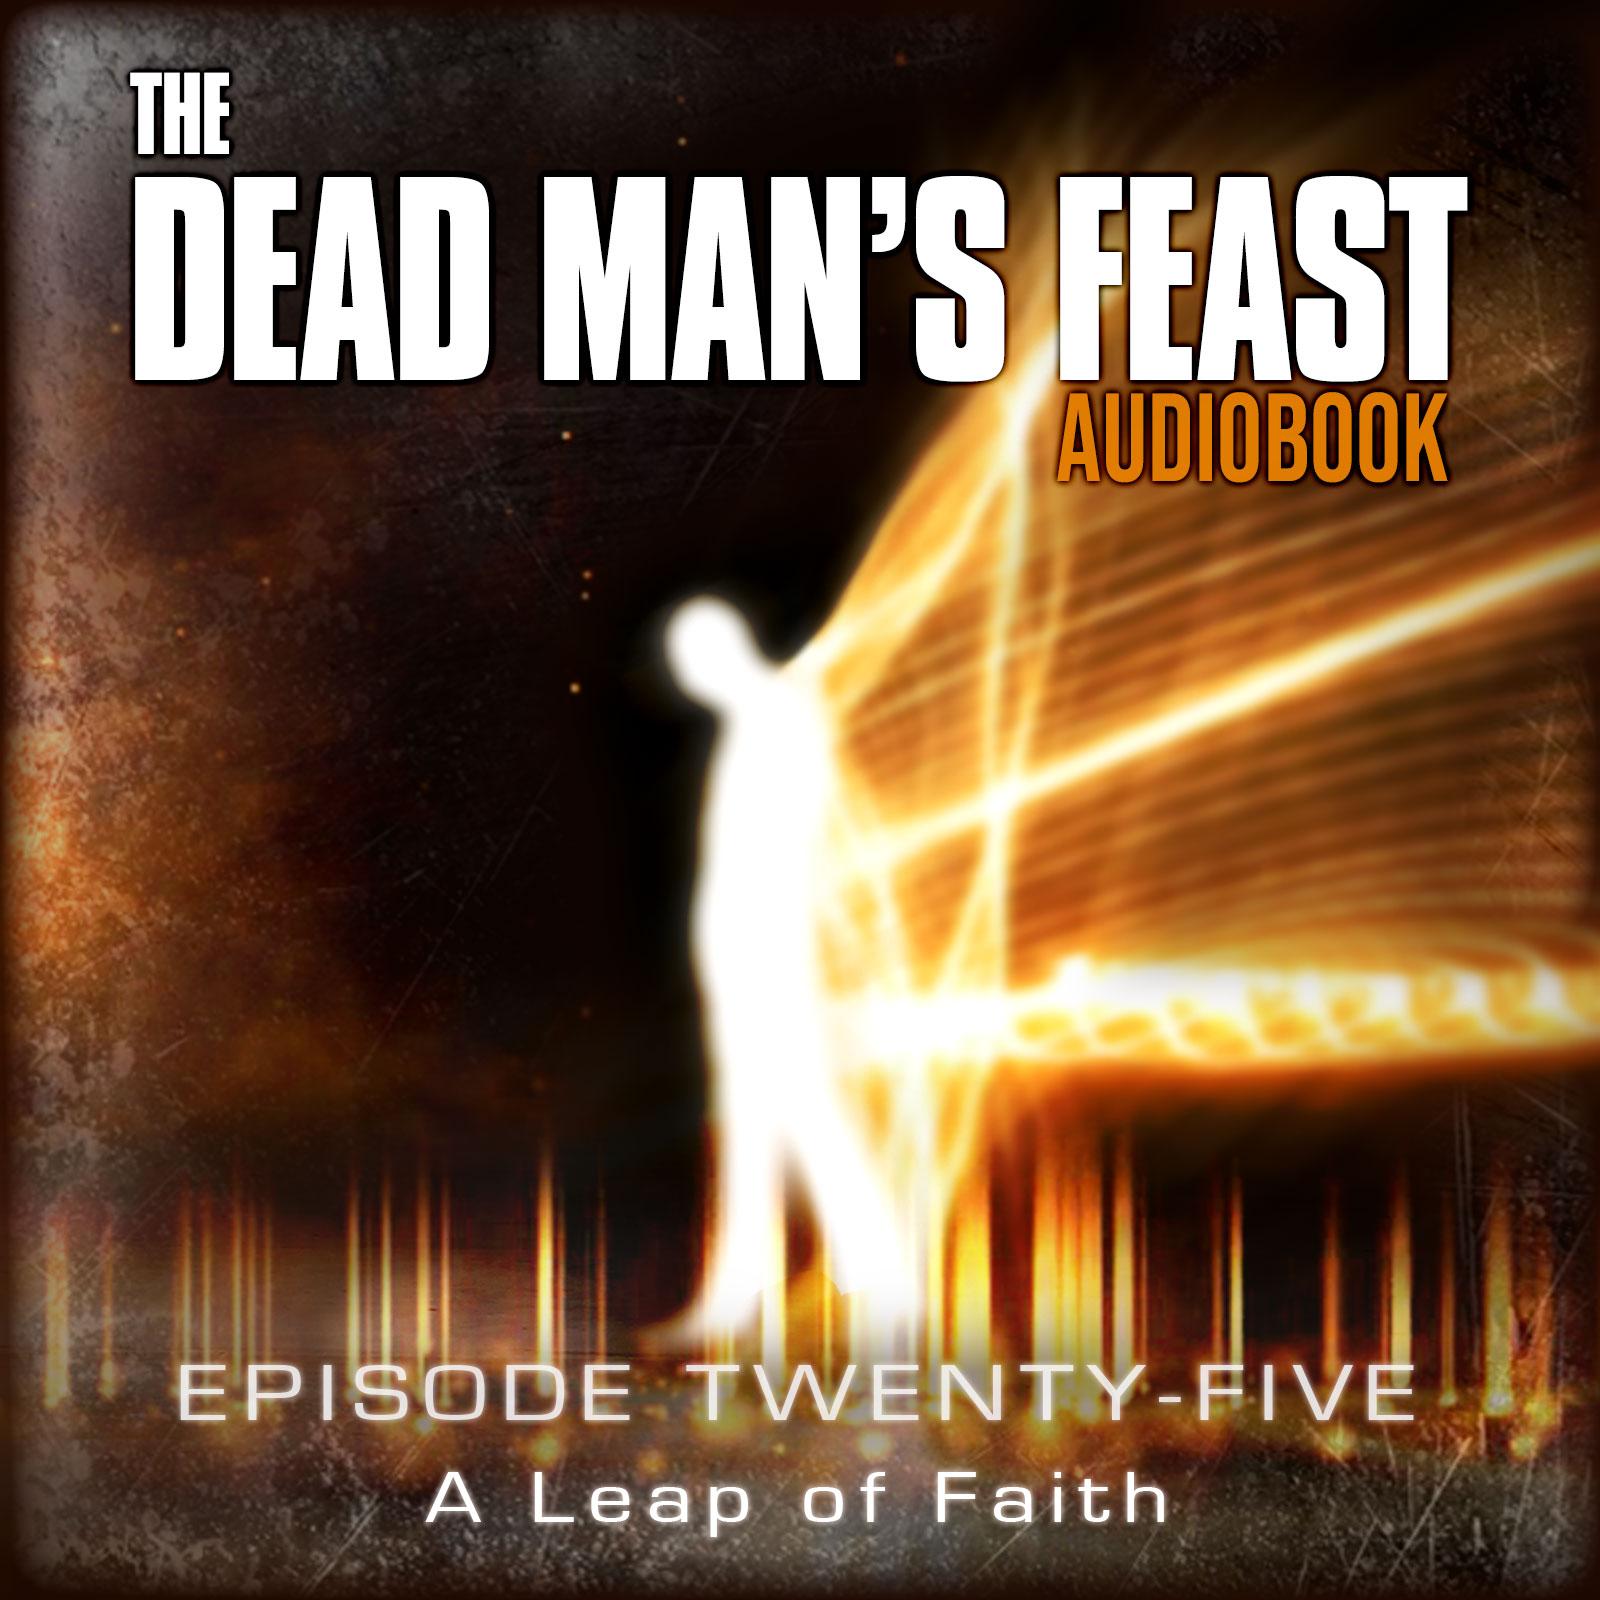 The Dead Man's Feast